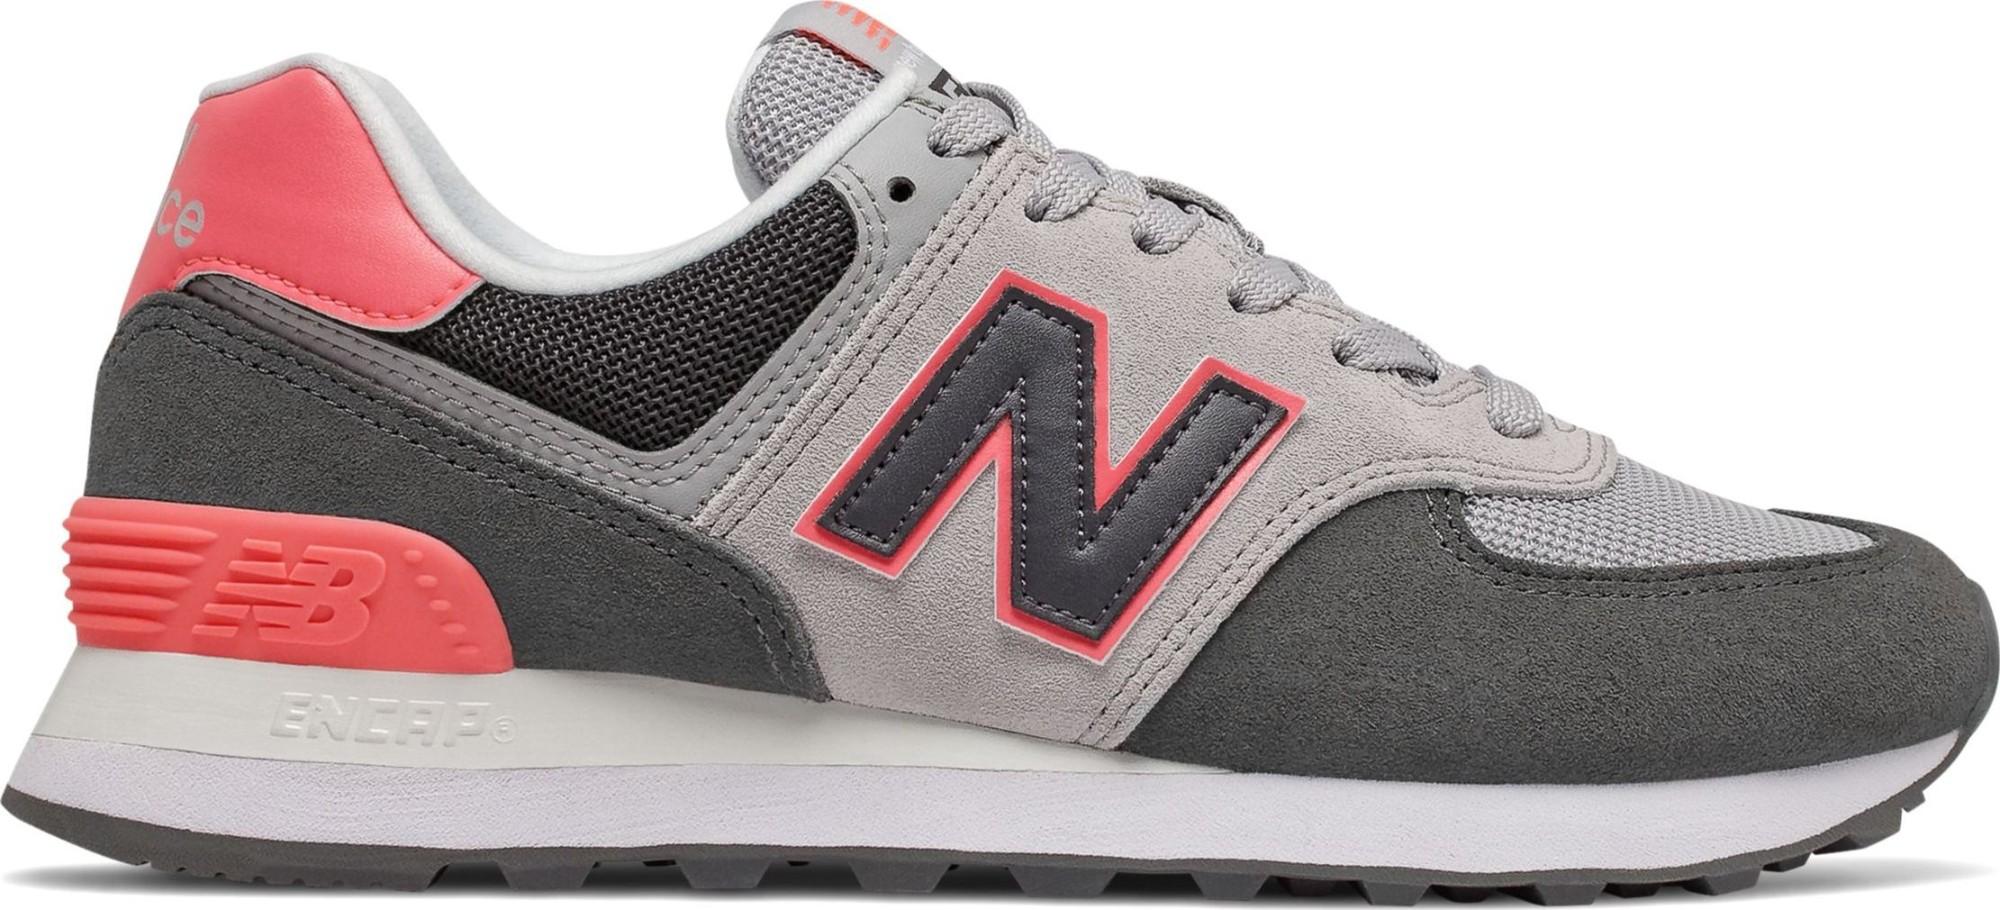 New Balance WL574 Nubuck Black/Pink 37